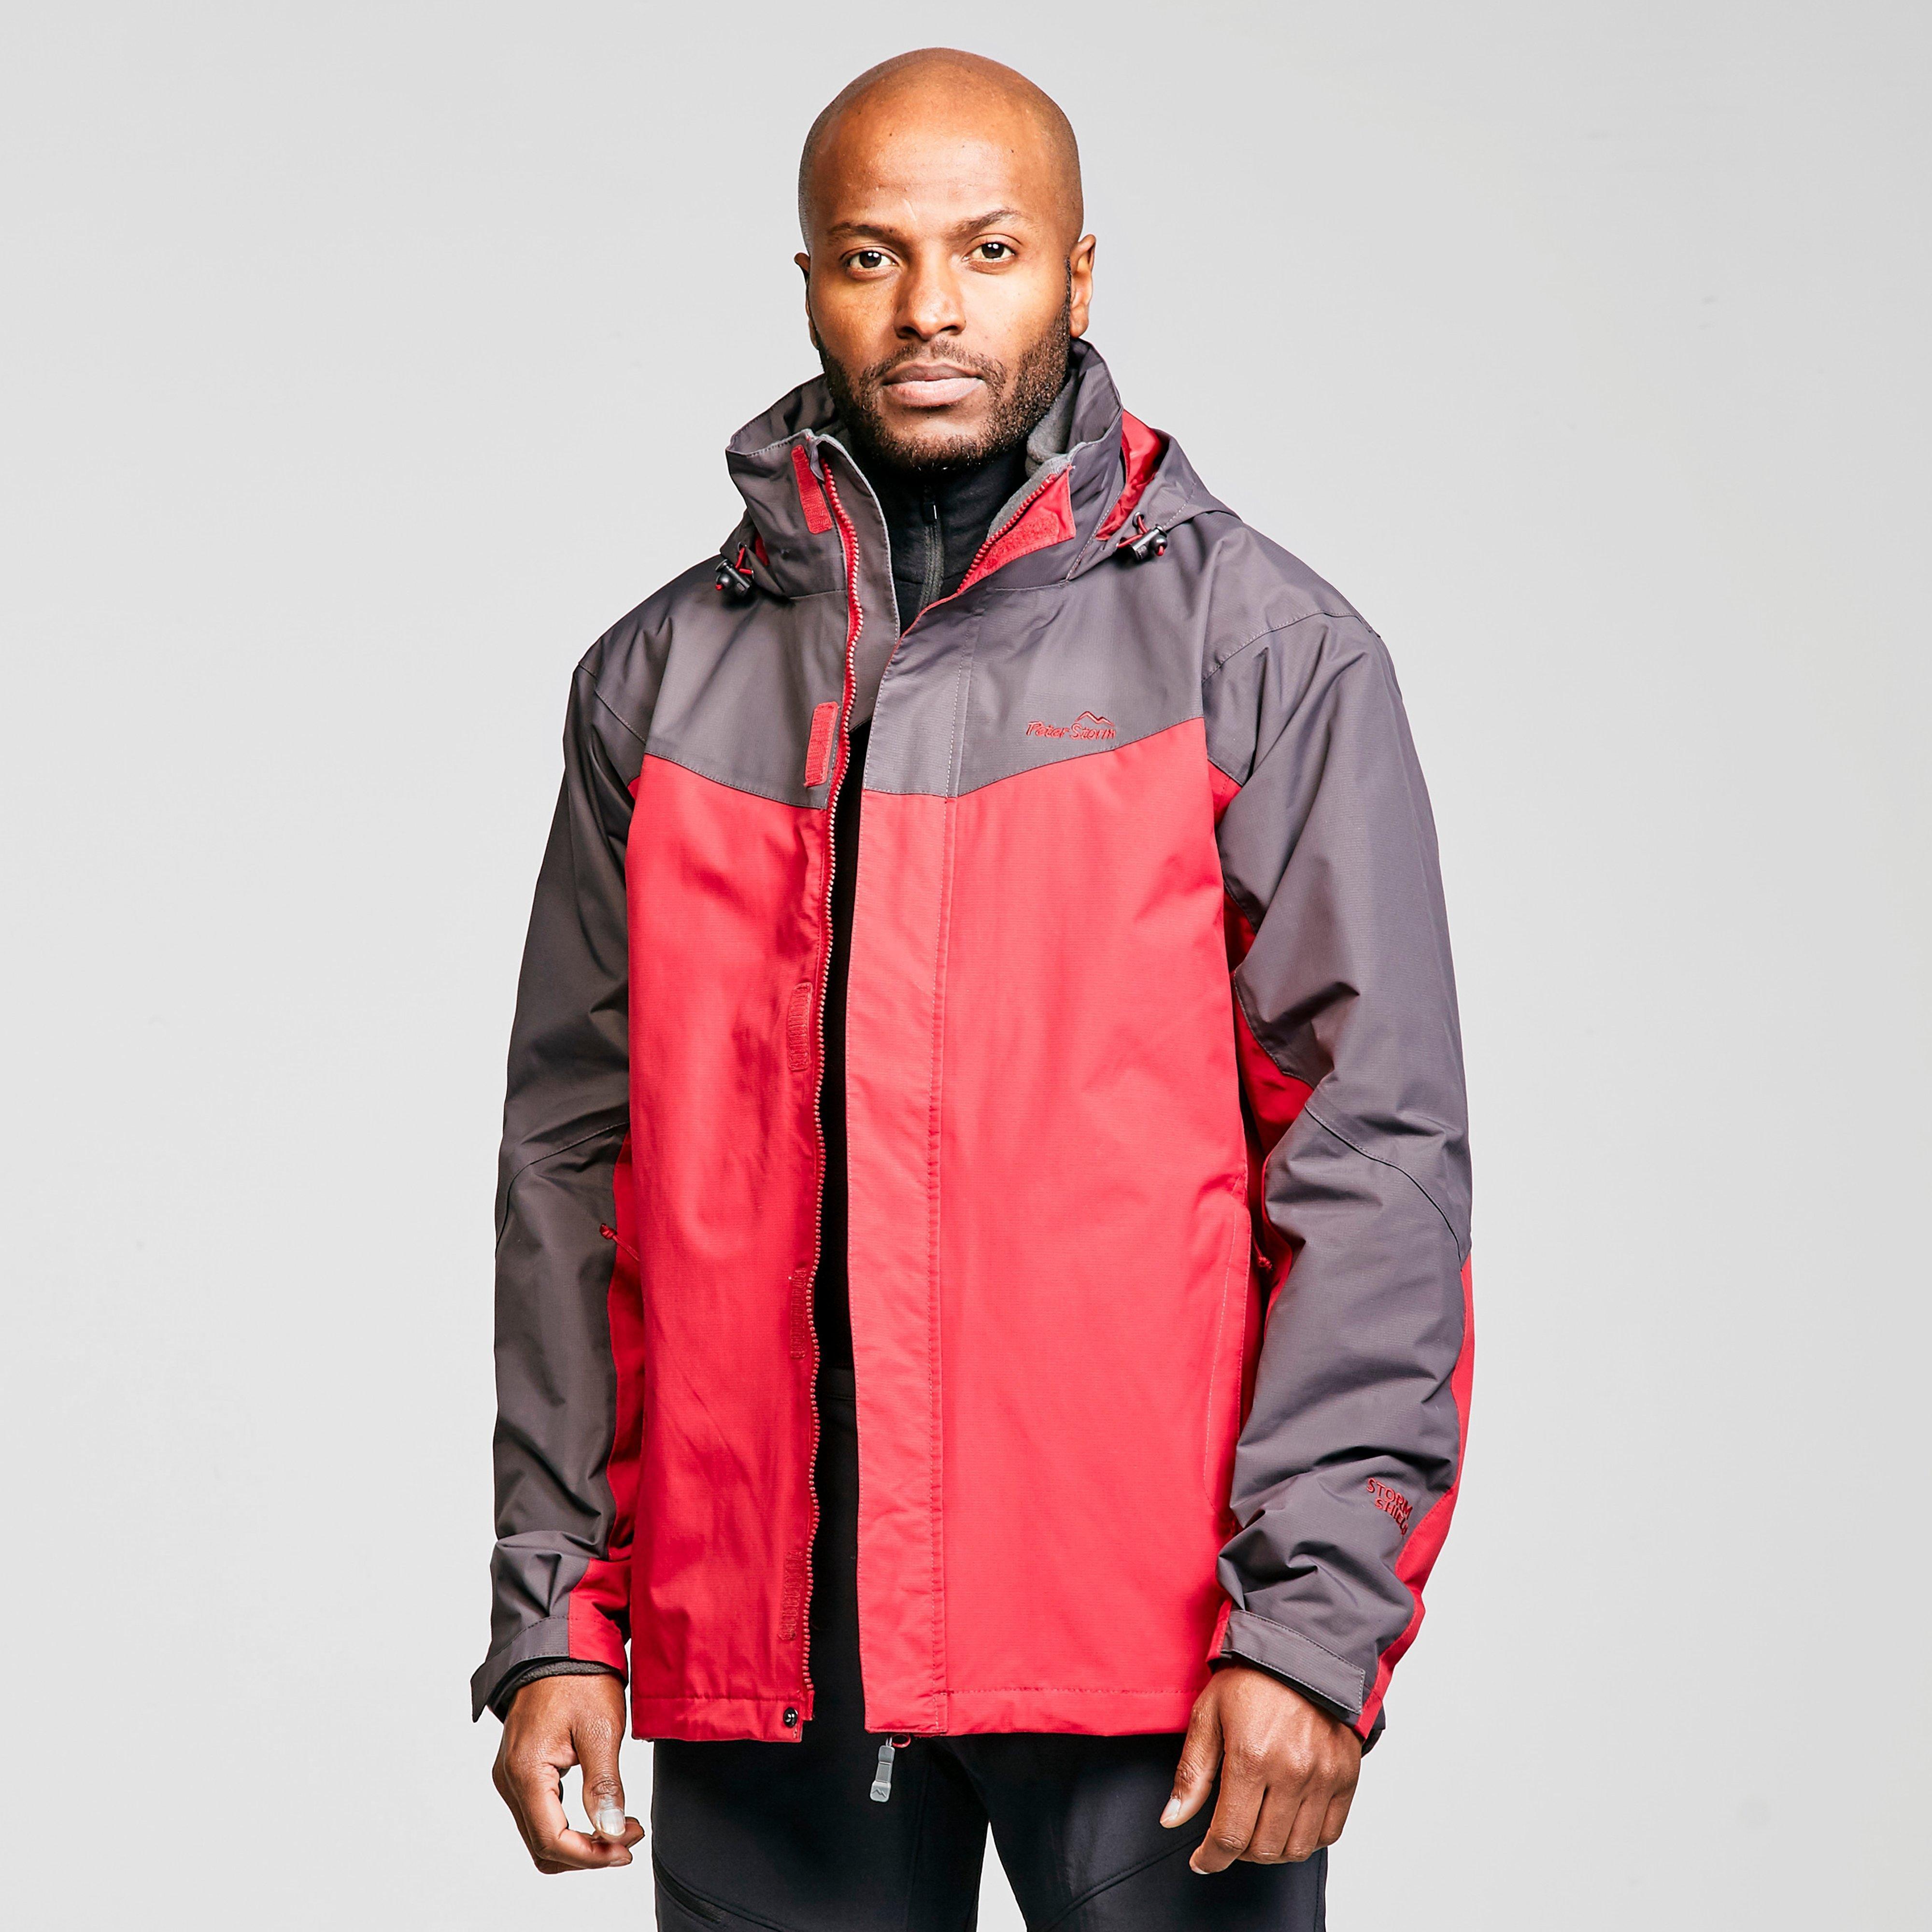 Peter Storm Men's Lakeside Iii 3-In-1 Jacket - Red/Grey, Red/Grey